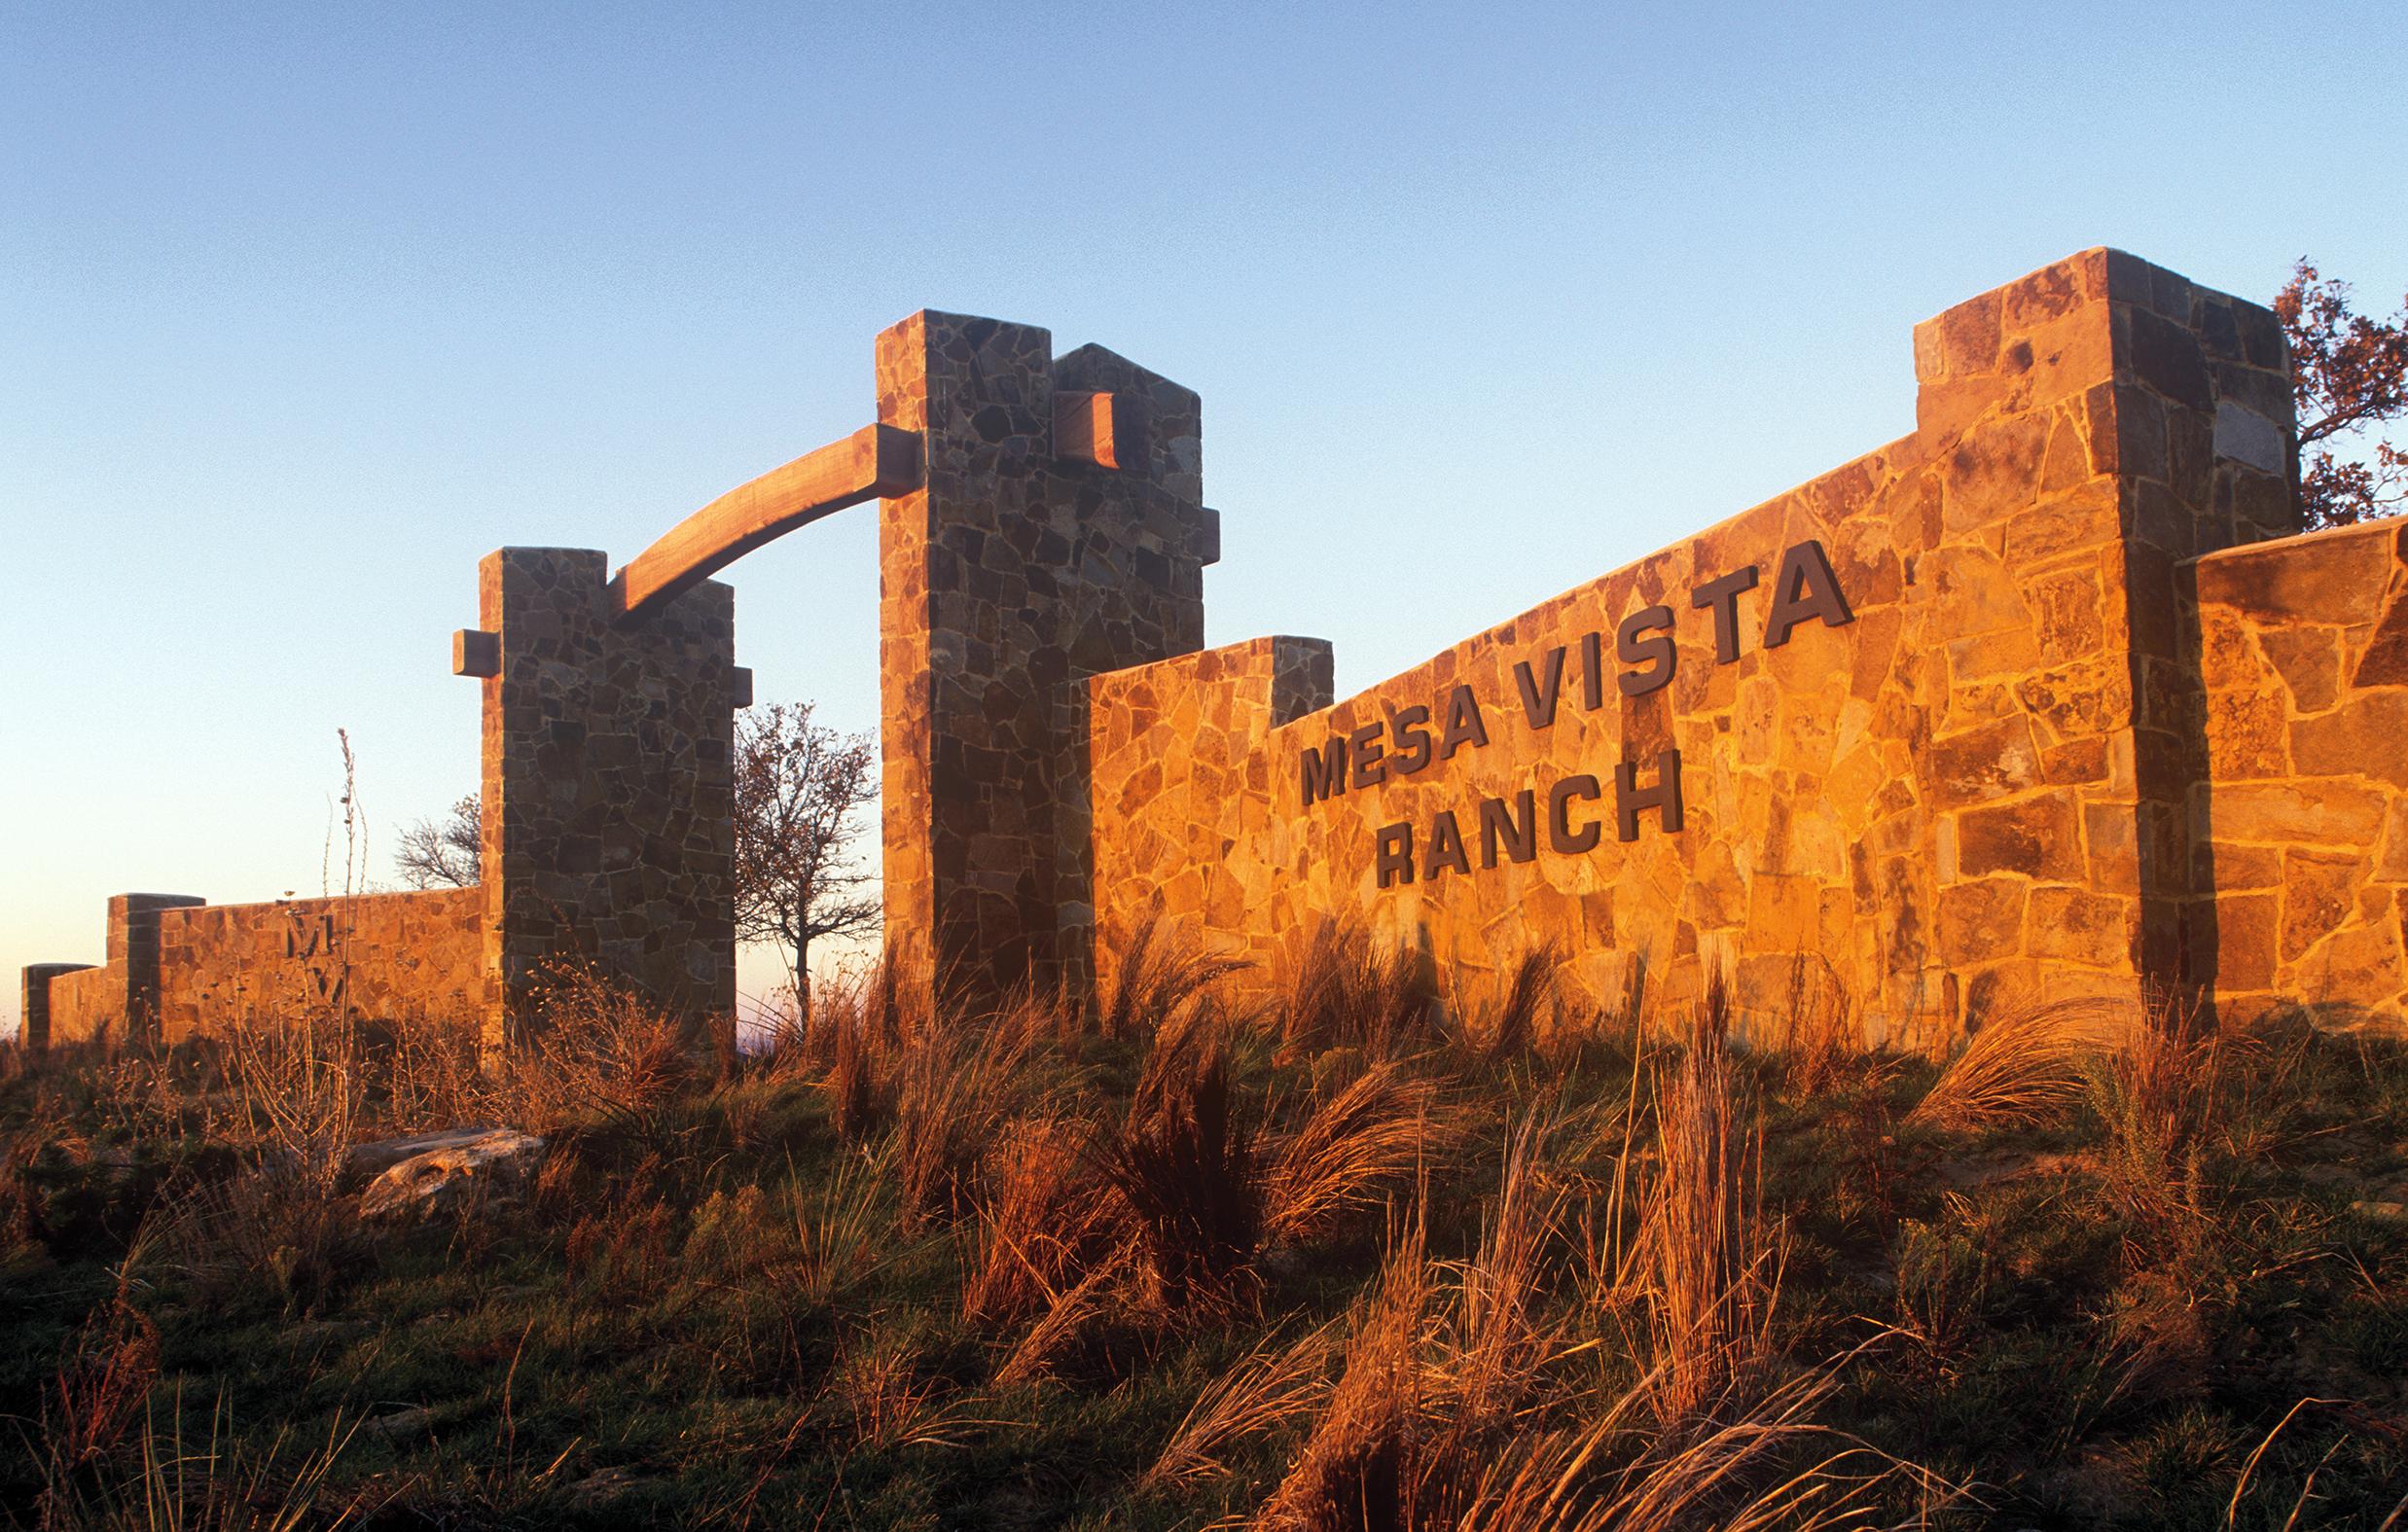 171204-t-boone-pickens-mesa-vista-ranch-19